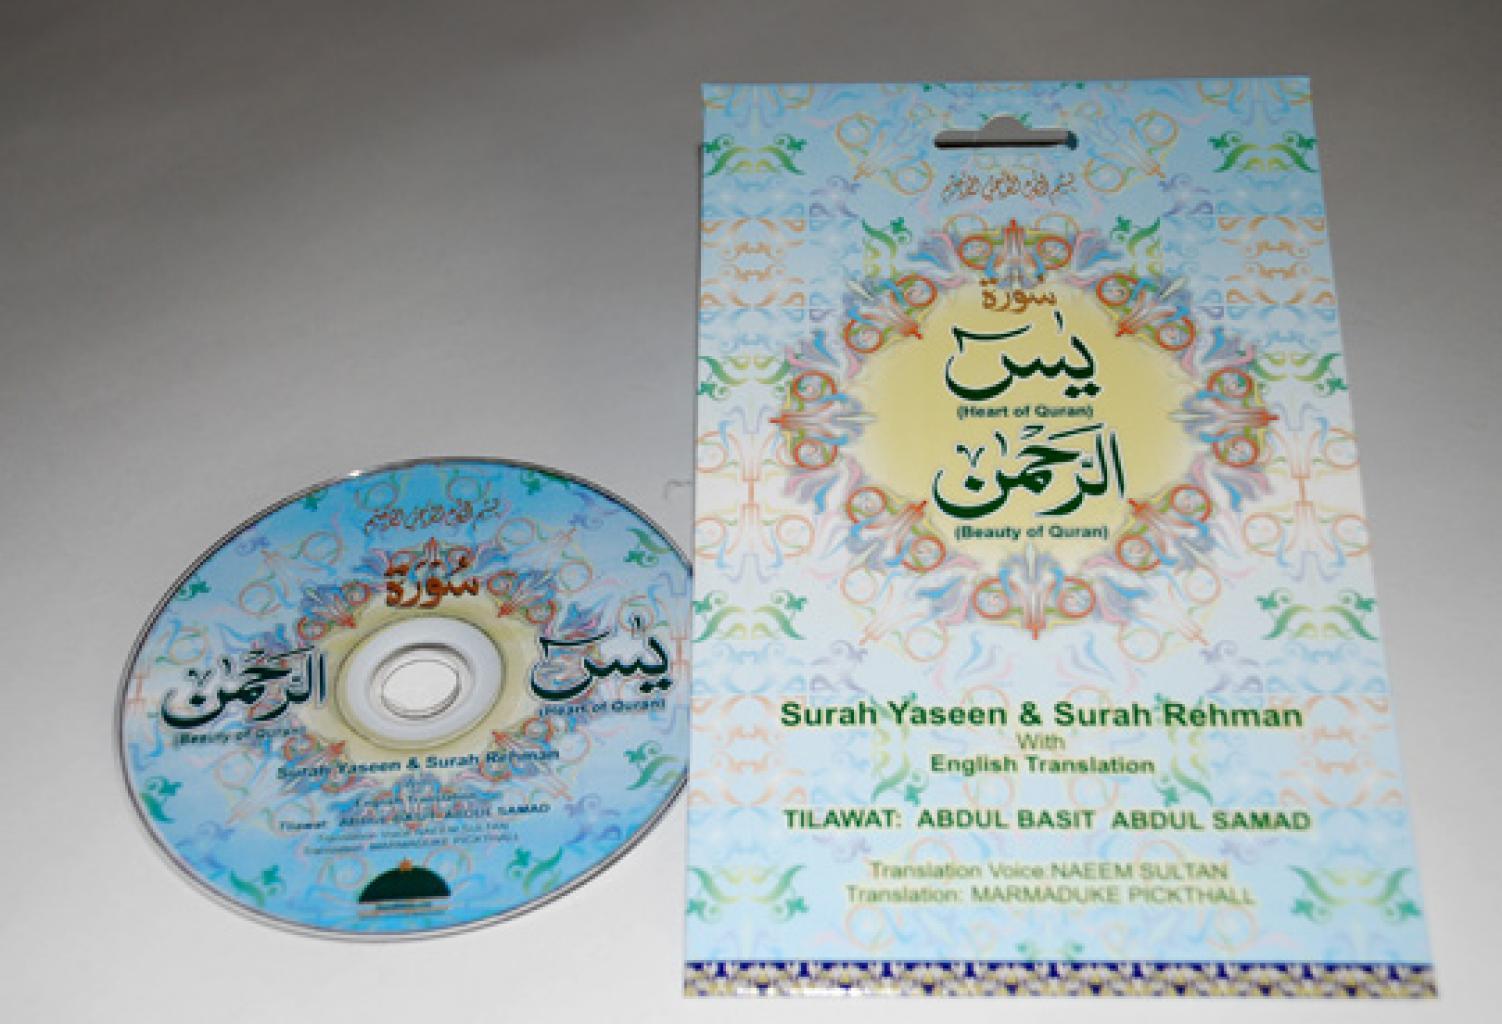 Quran Surah CDs ii715